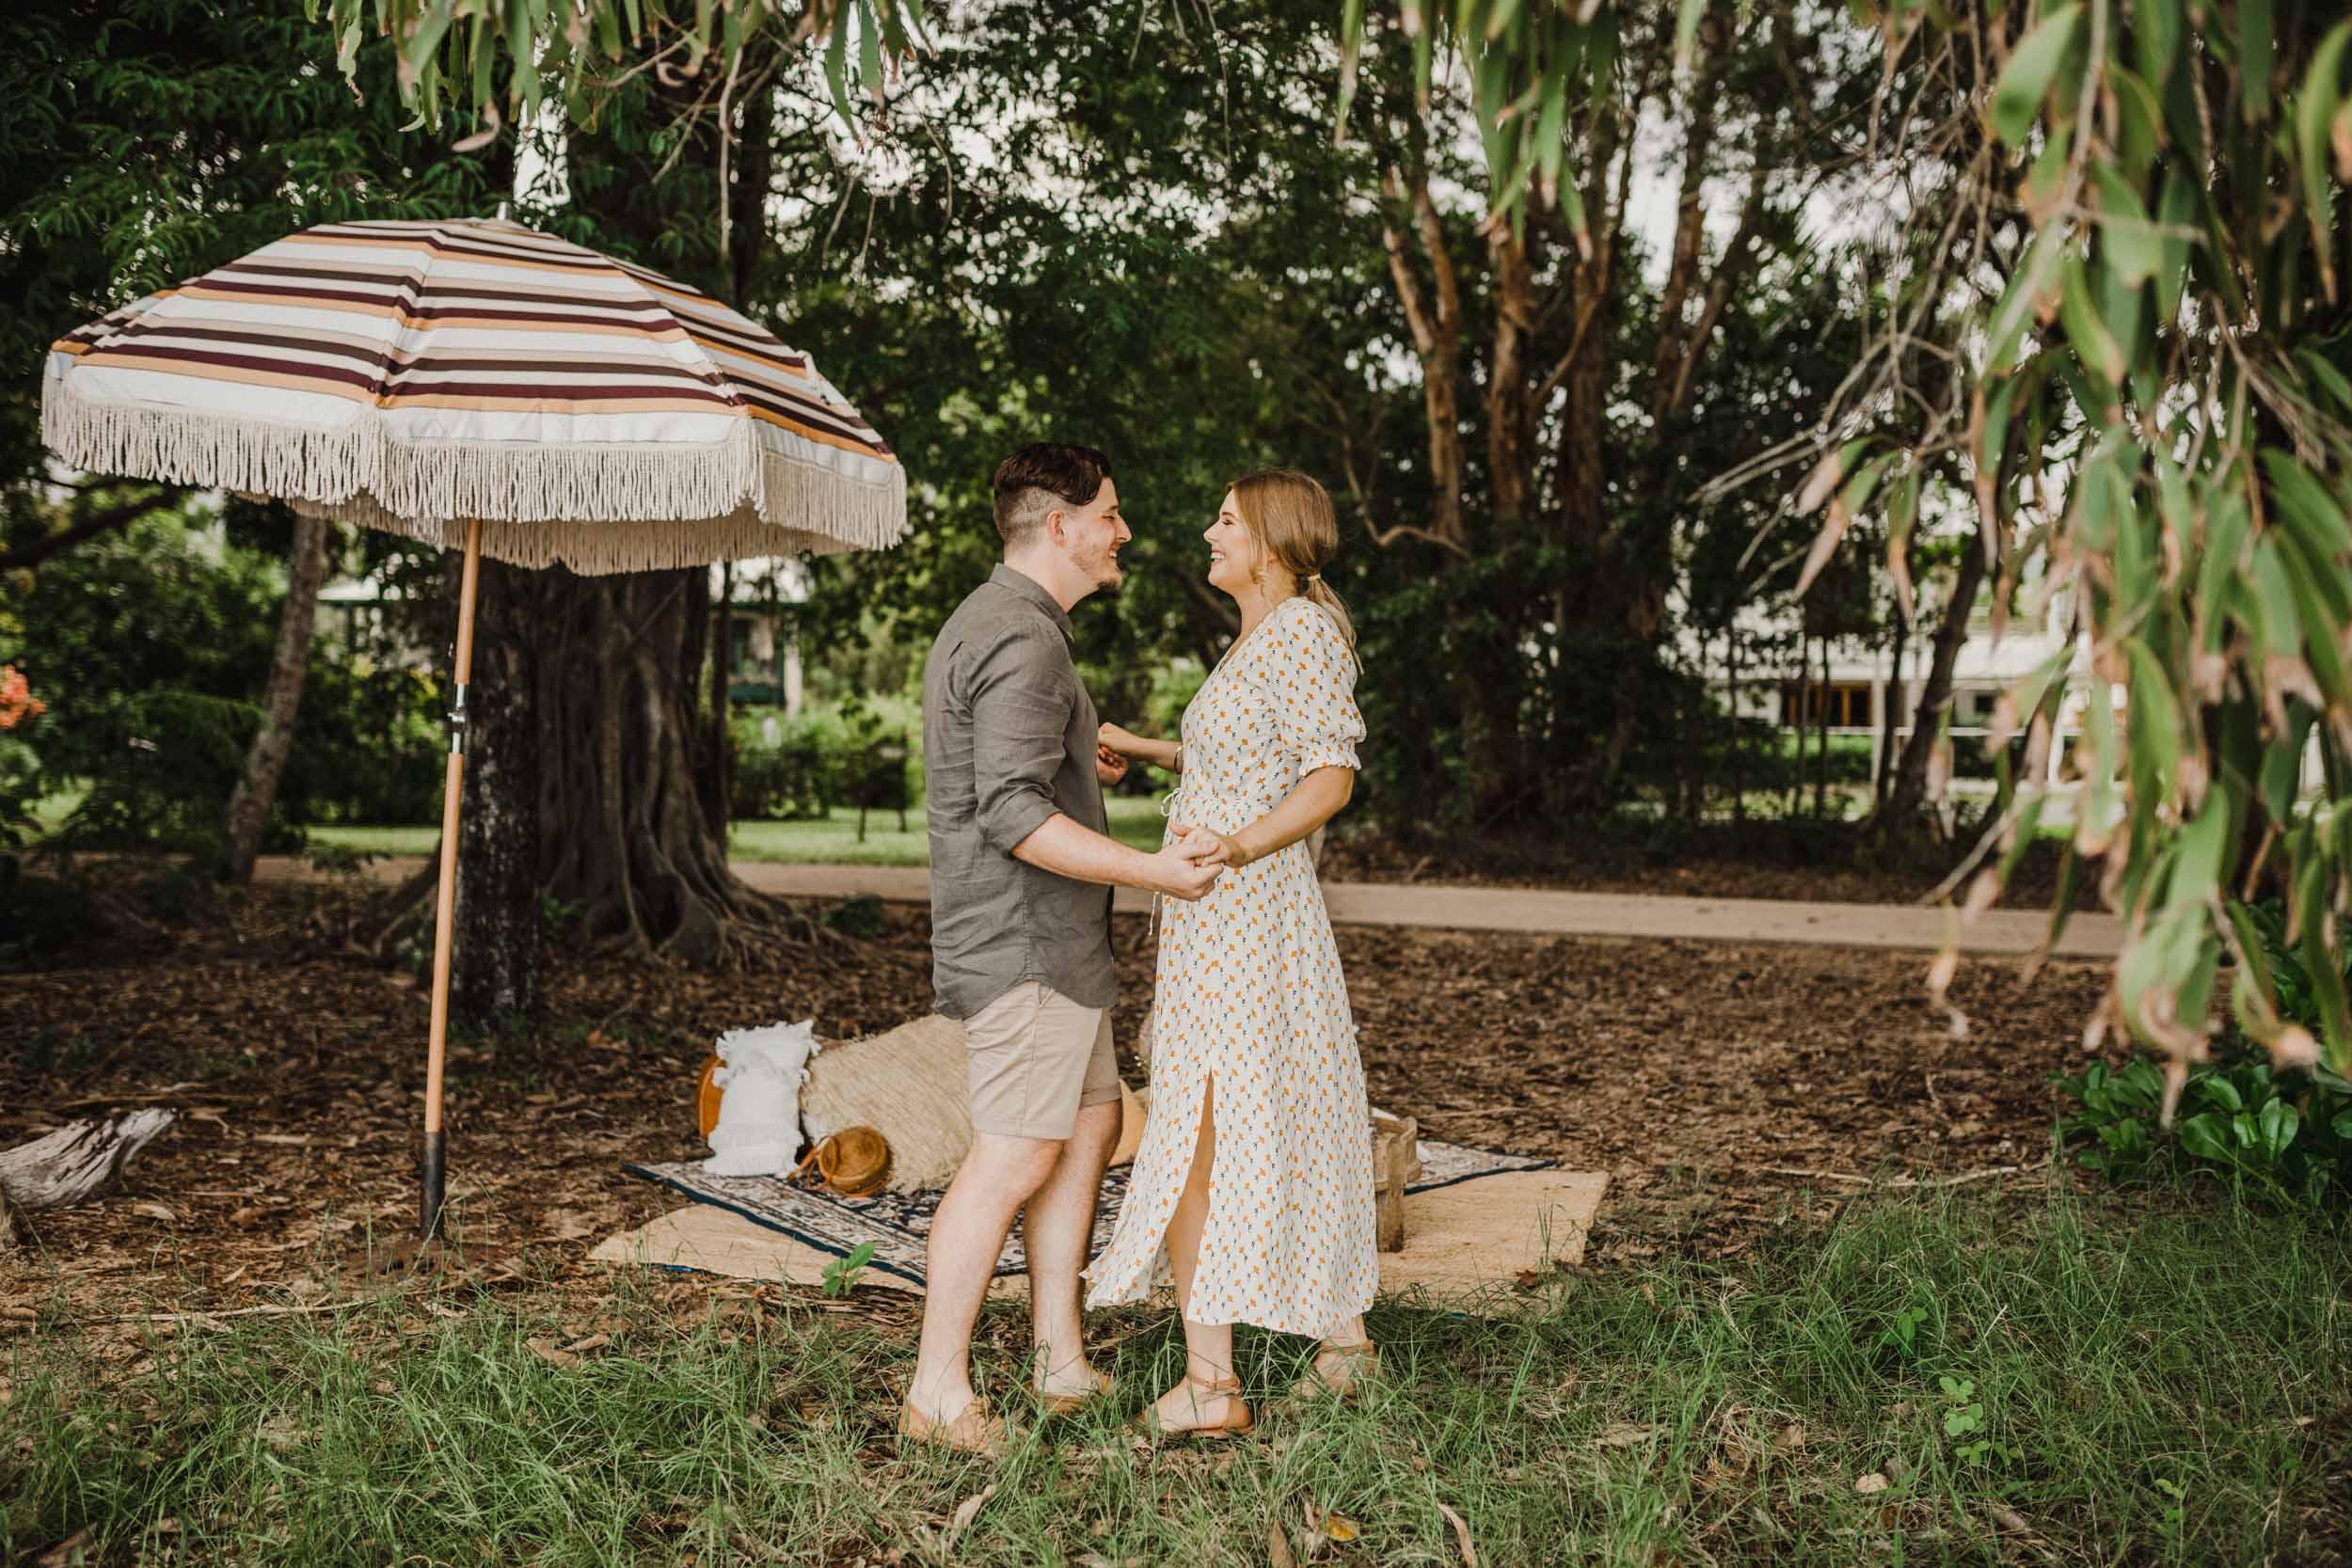 The Raw Photographer - Cairns Wedding Photographer - Beach Engagement Shoot - Candid Picnic-14.jpg